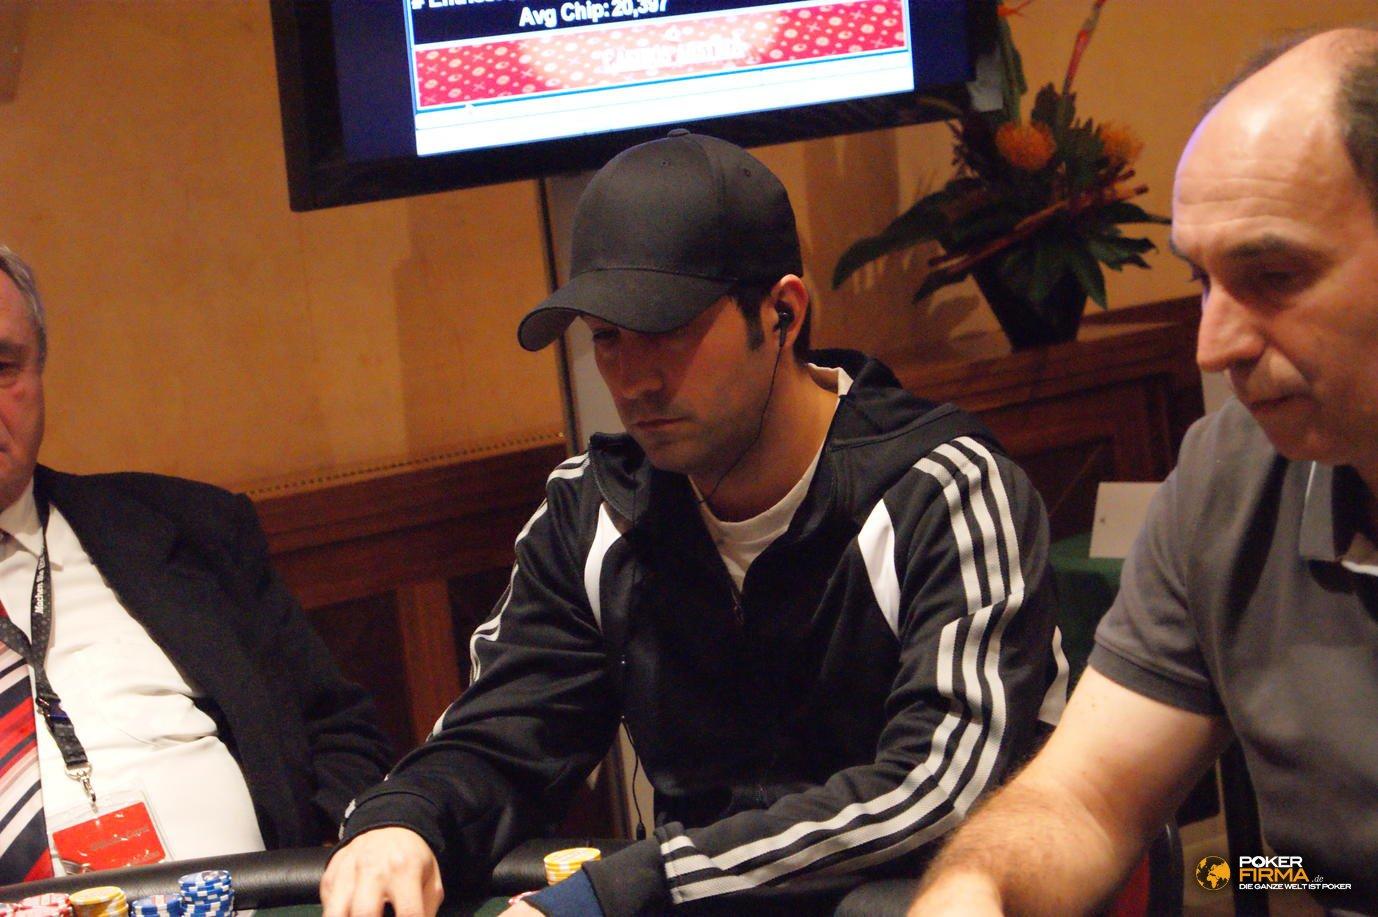 Poker_EM_2000_NLH_251011_Marco_Liesy